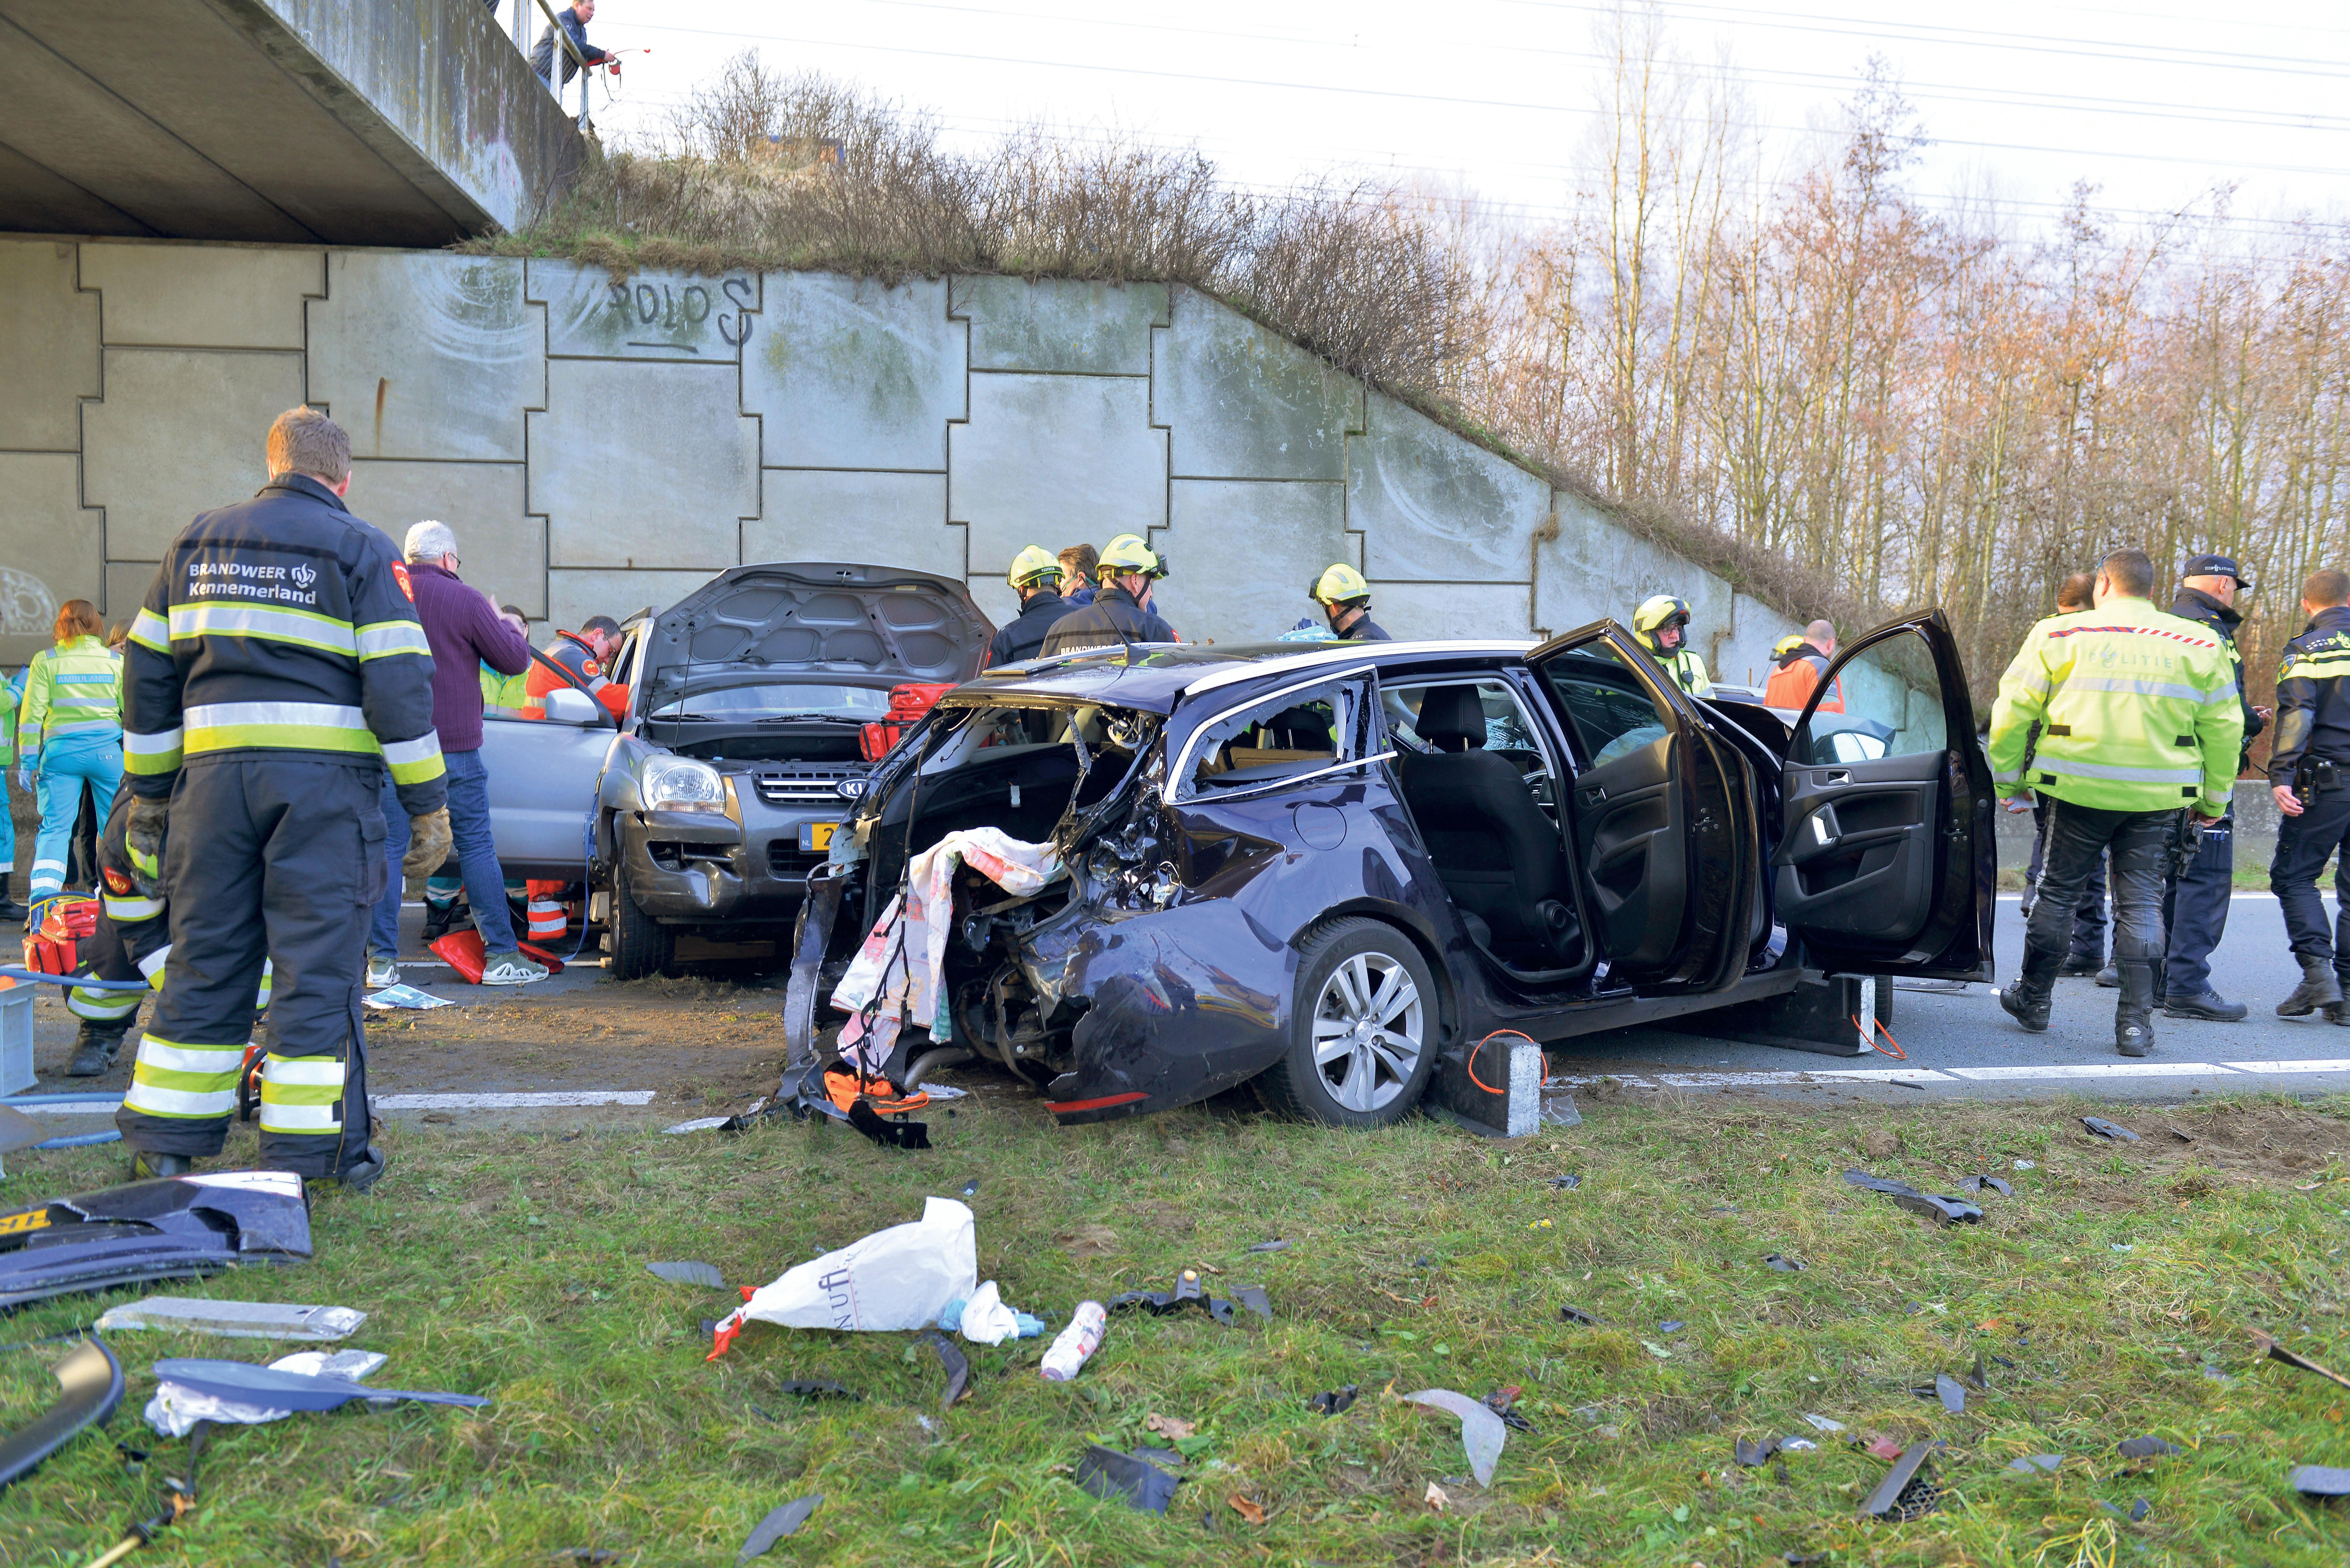 'Veroorzaker kettingbotsing is meer dan agressieve idioot'; Hoofddorper zette uit woede auto stil op Drie Merenweg